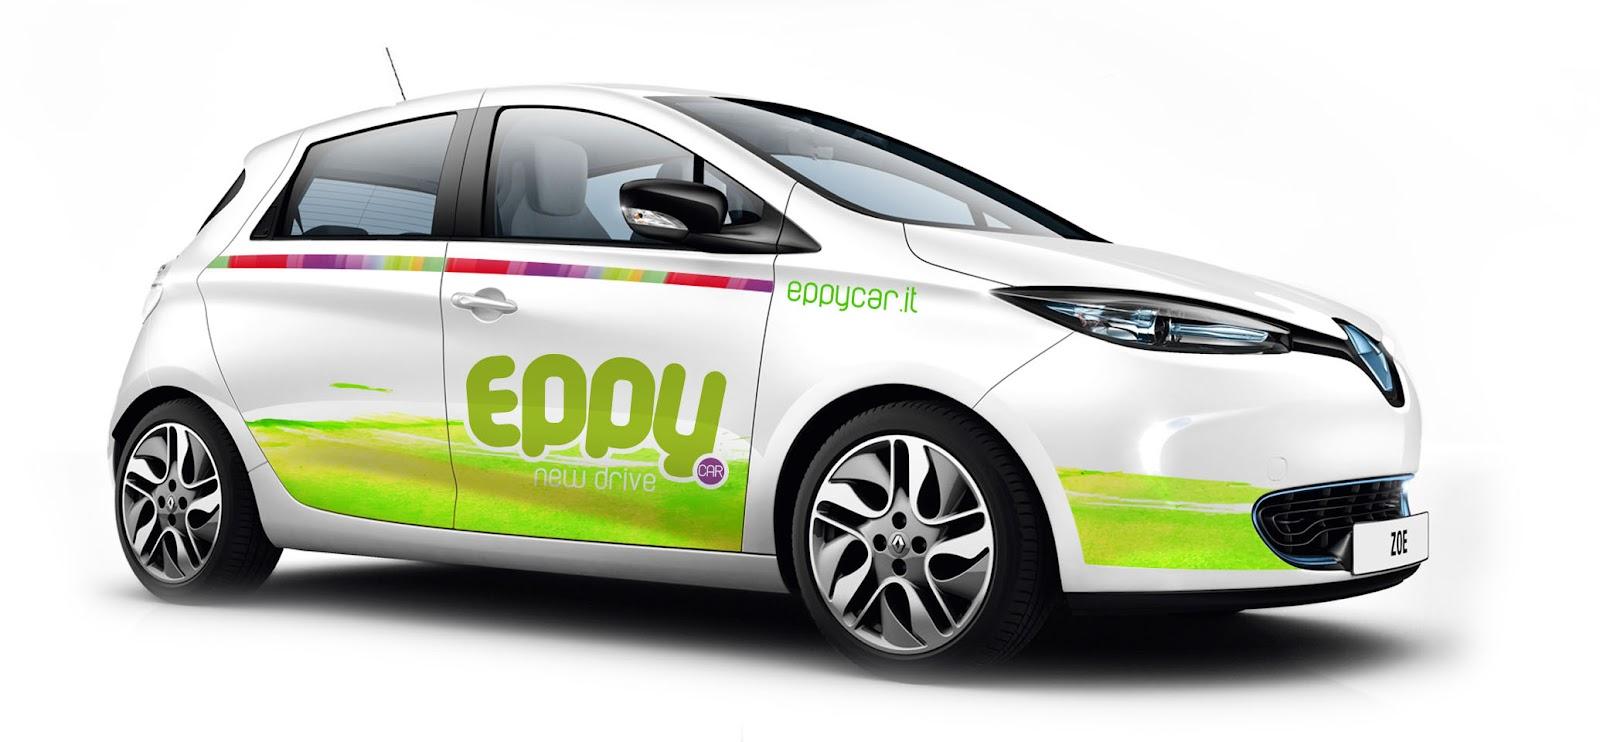 Auto Eppy Car.jpg